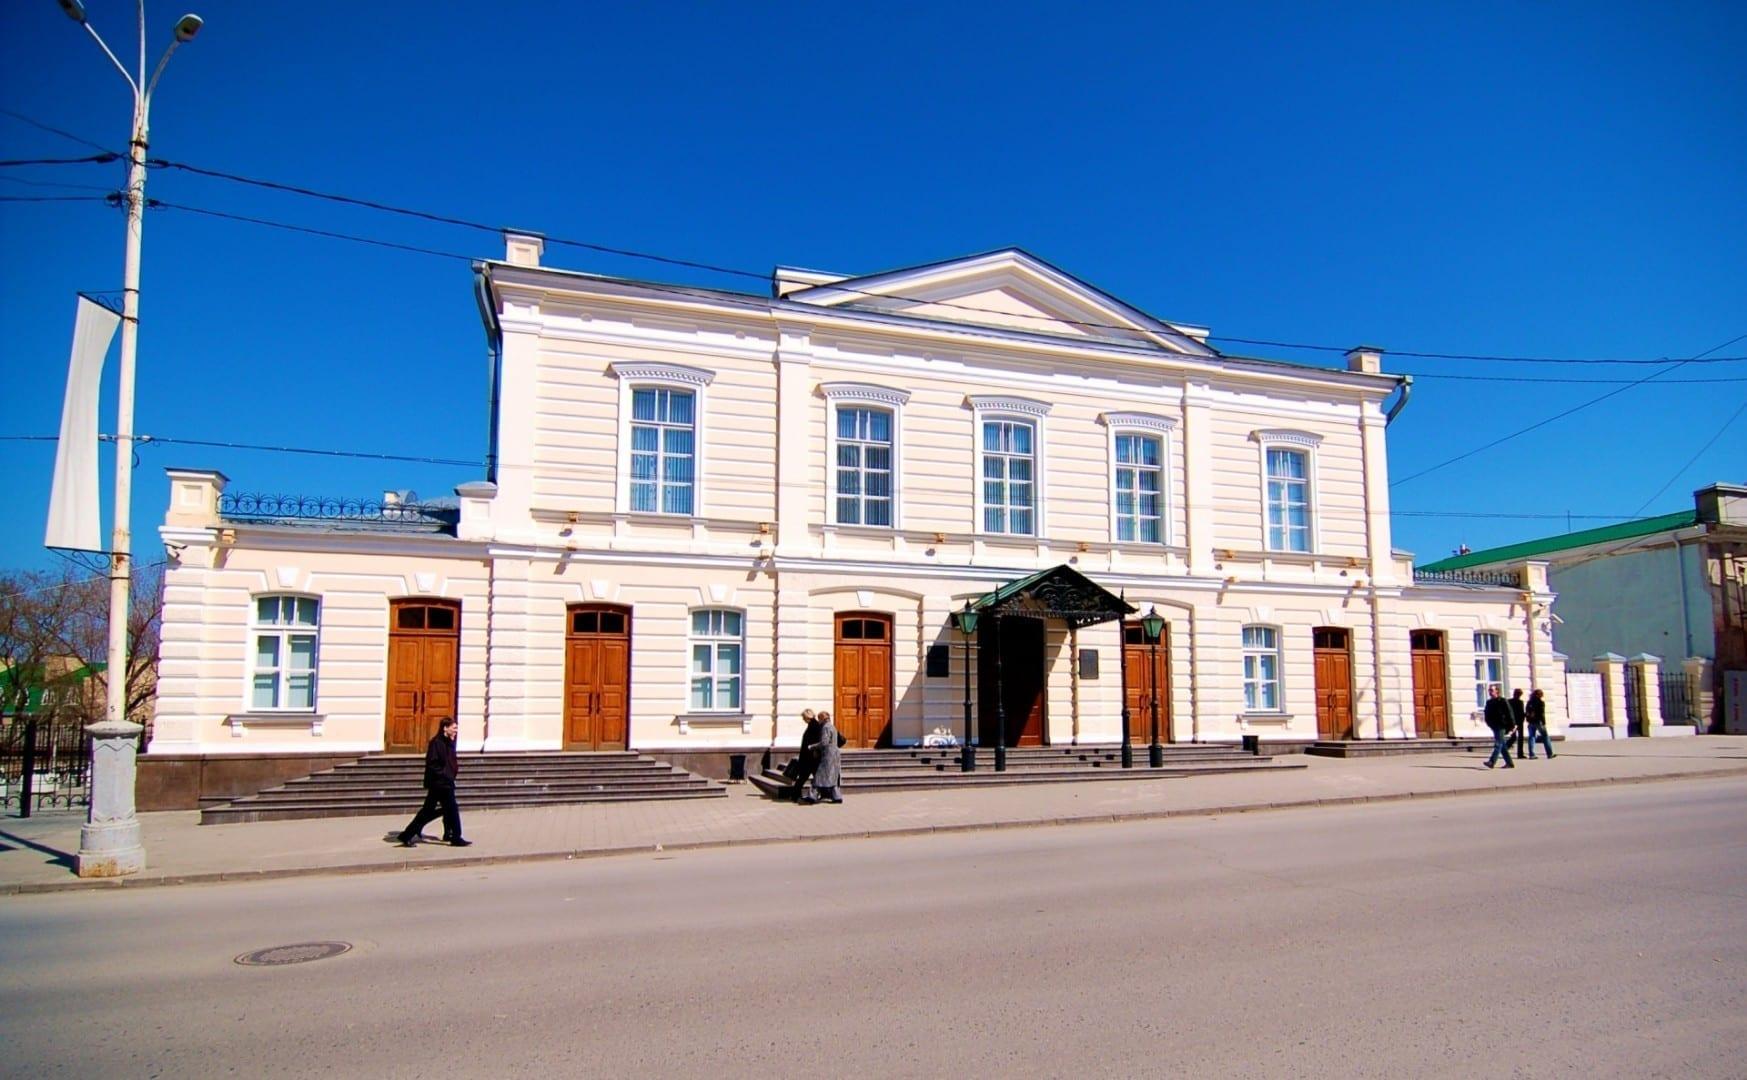 Teatro de Drama Taganrog Chejov Taganrog Rusia